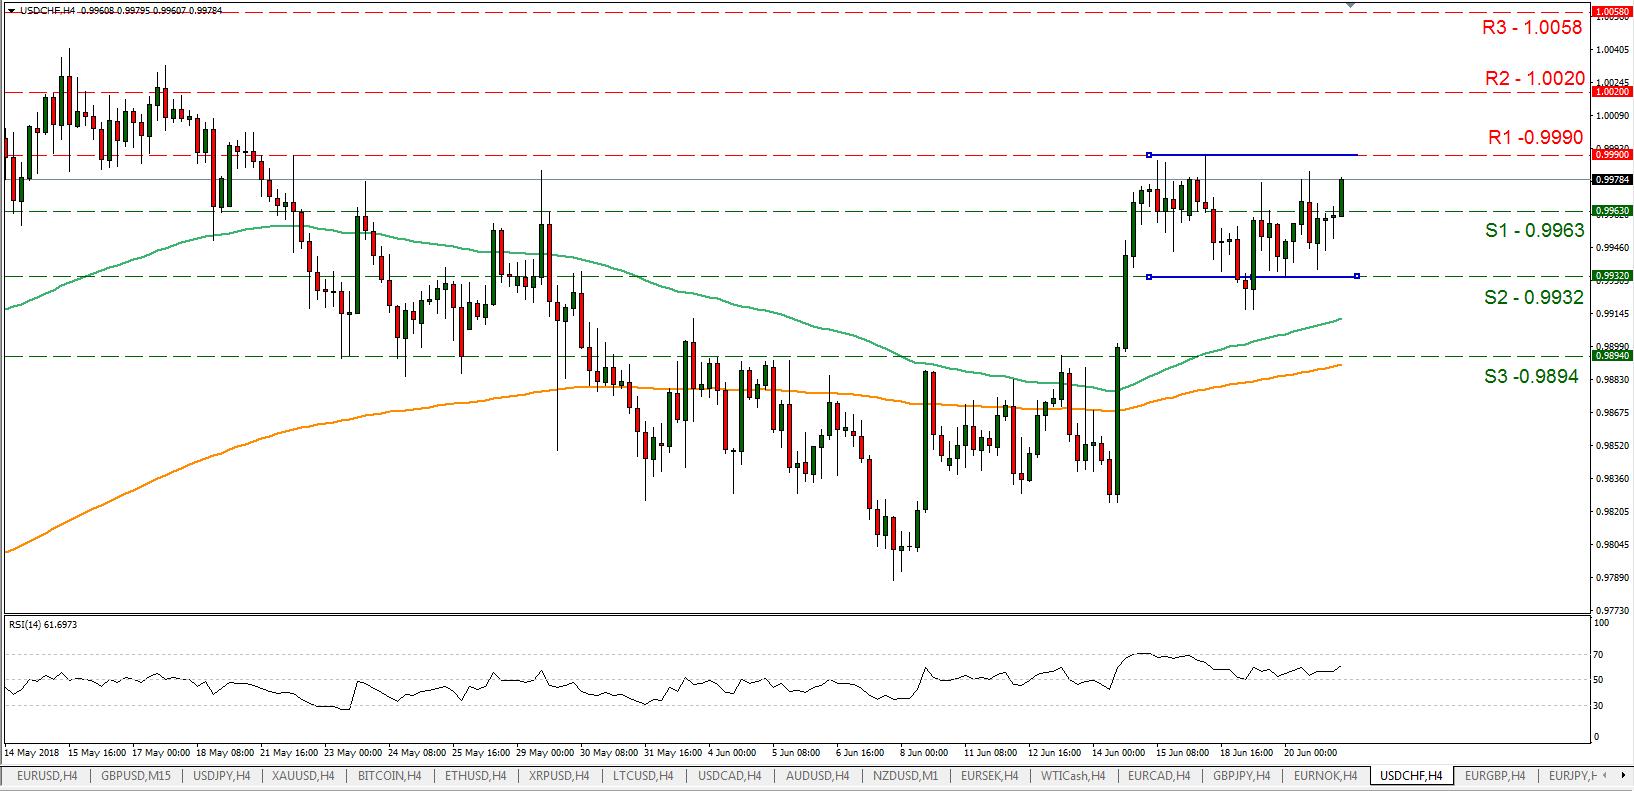 USD/CHF 21/06/2018 | EconAlerts